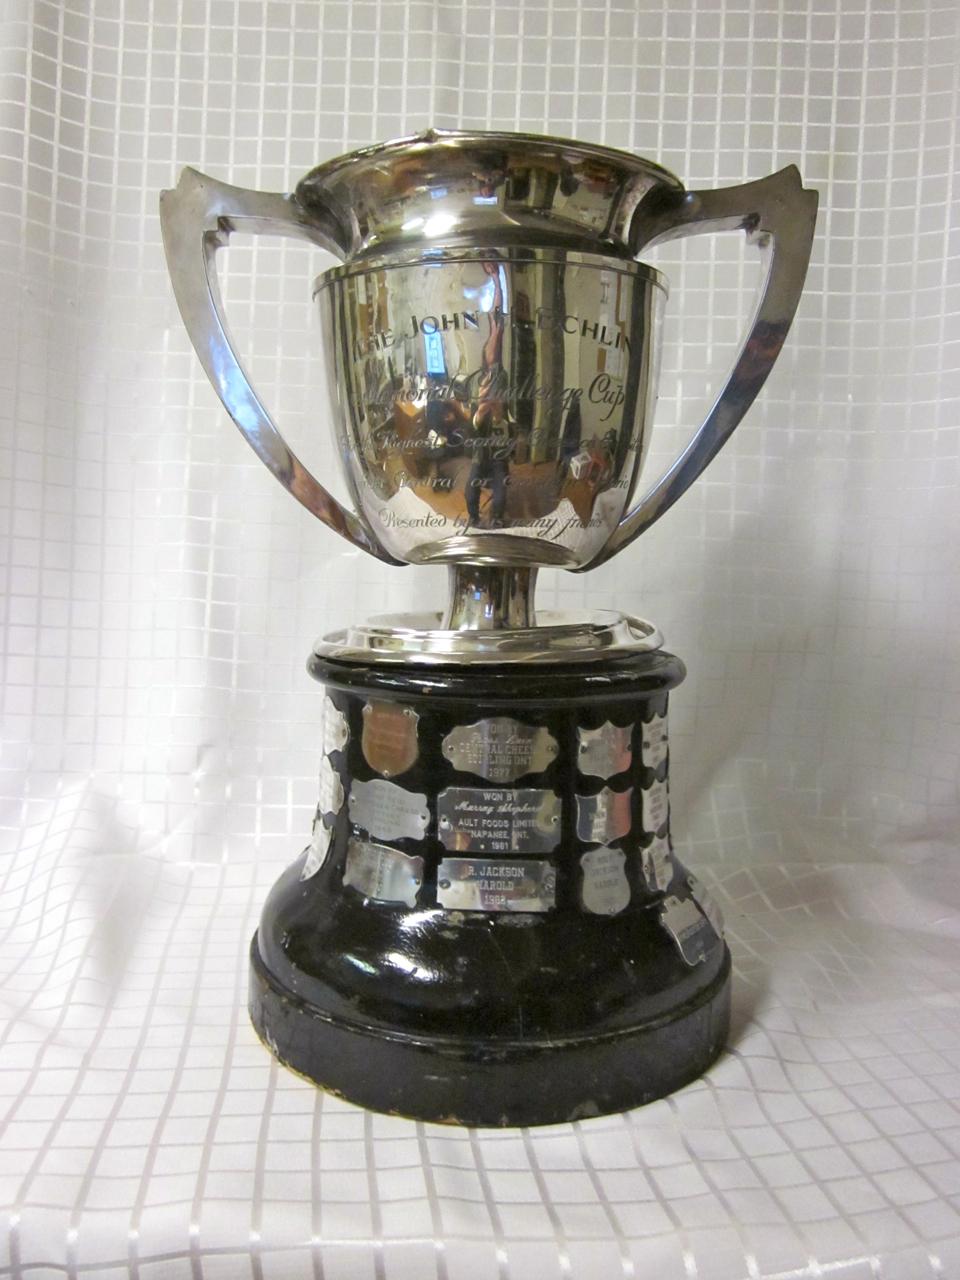 John H. Echlin Memorial Challenge Trophy